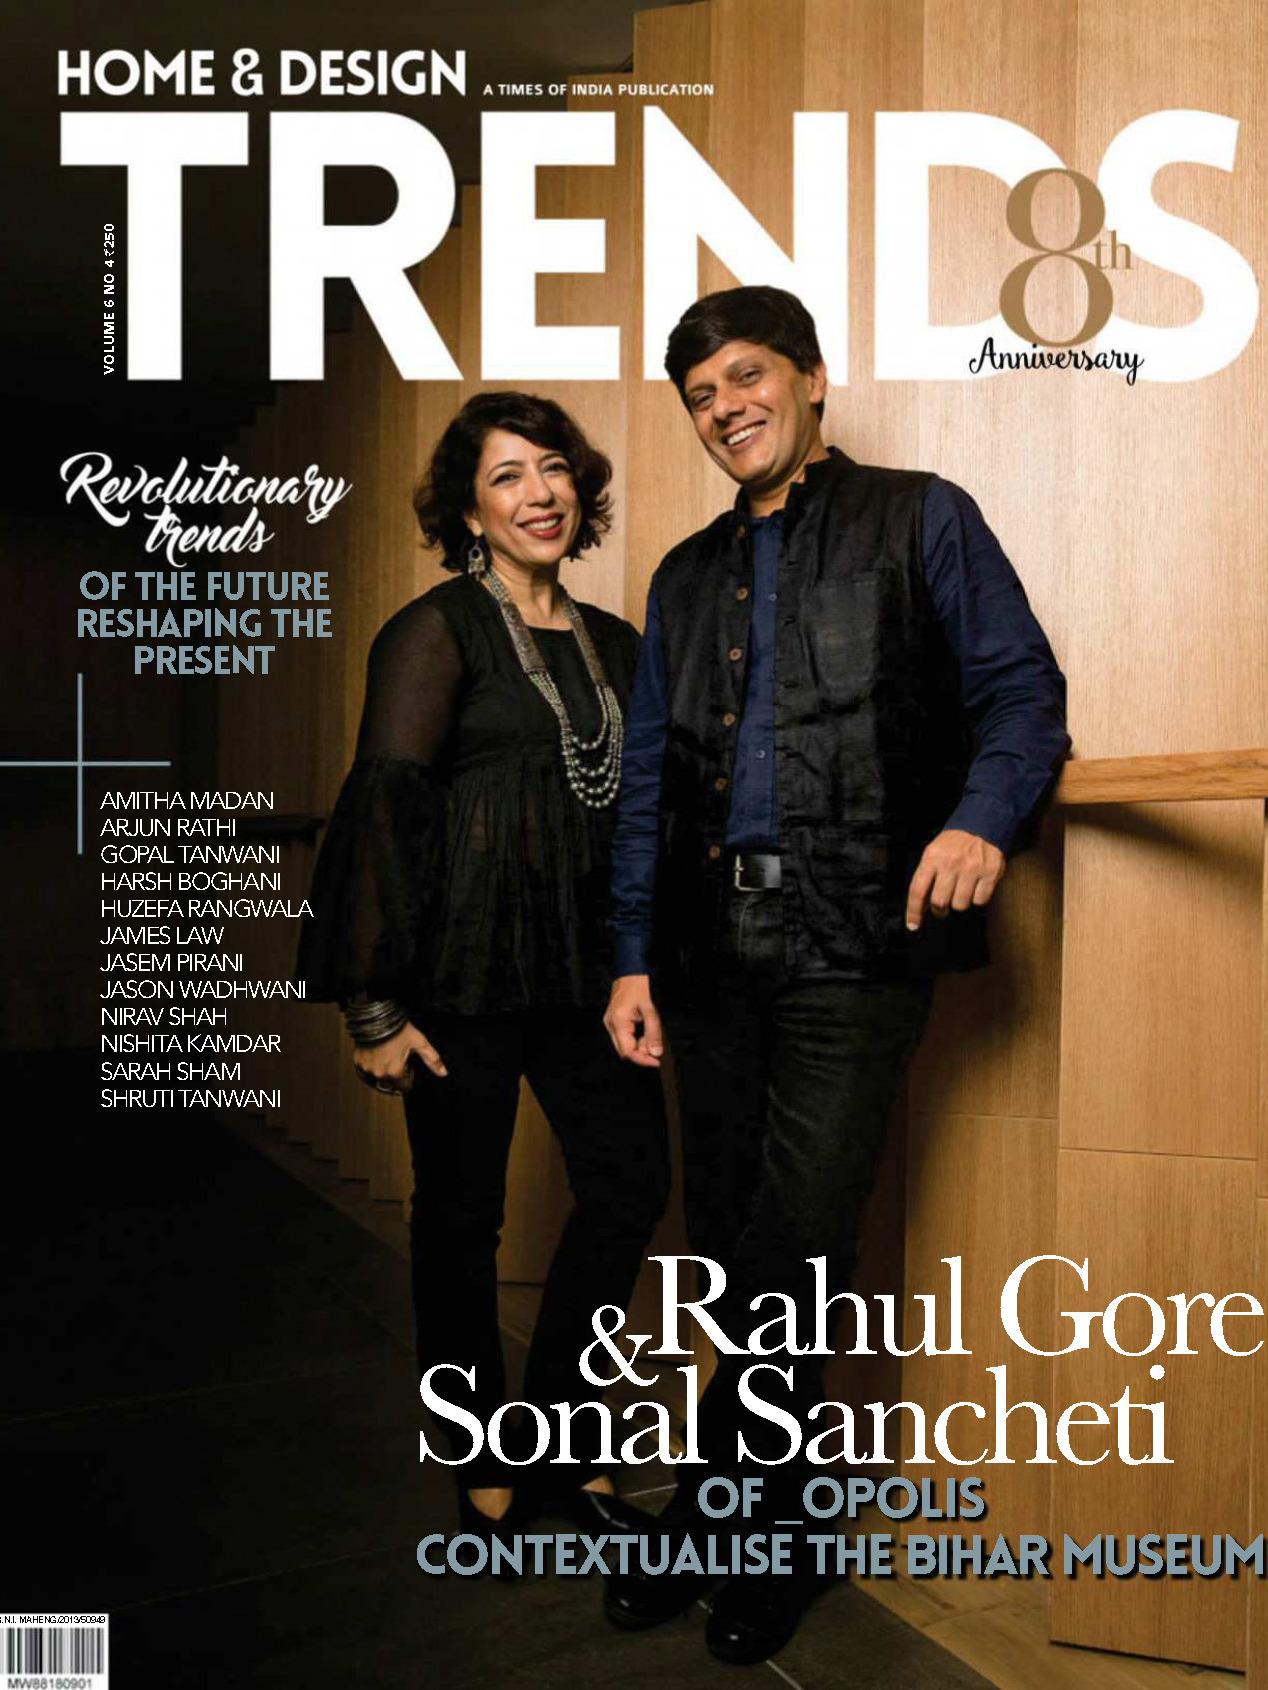 《Home & Design Trends》英国版室内设计杂志2017年09月号